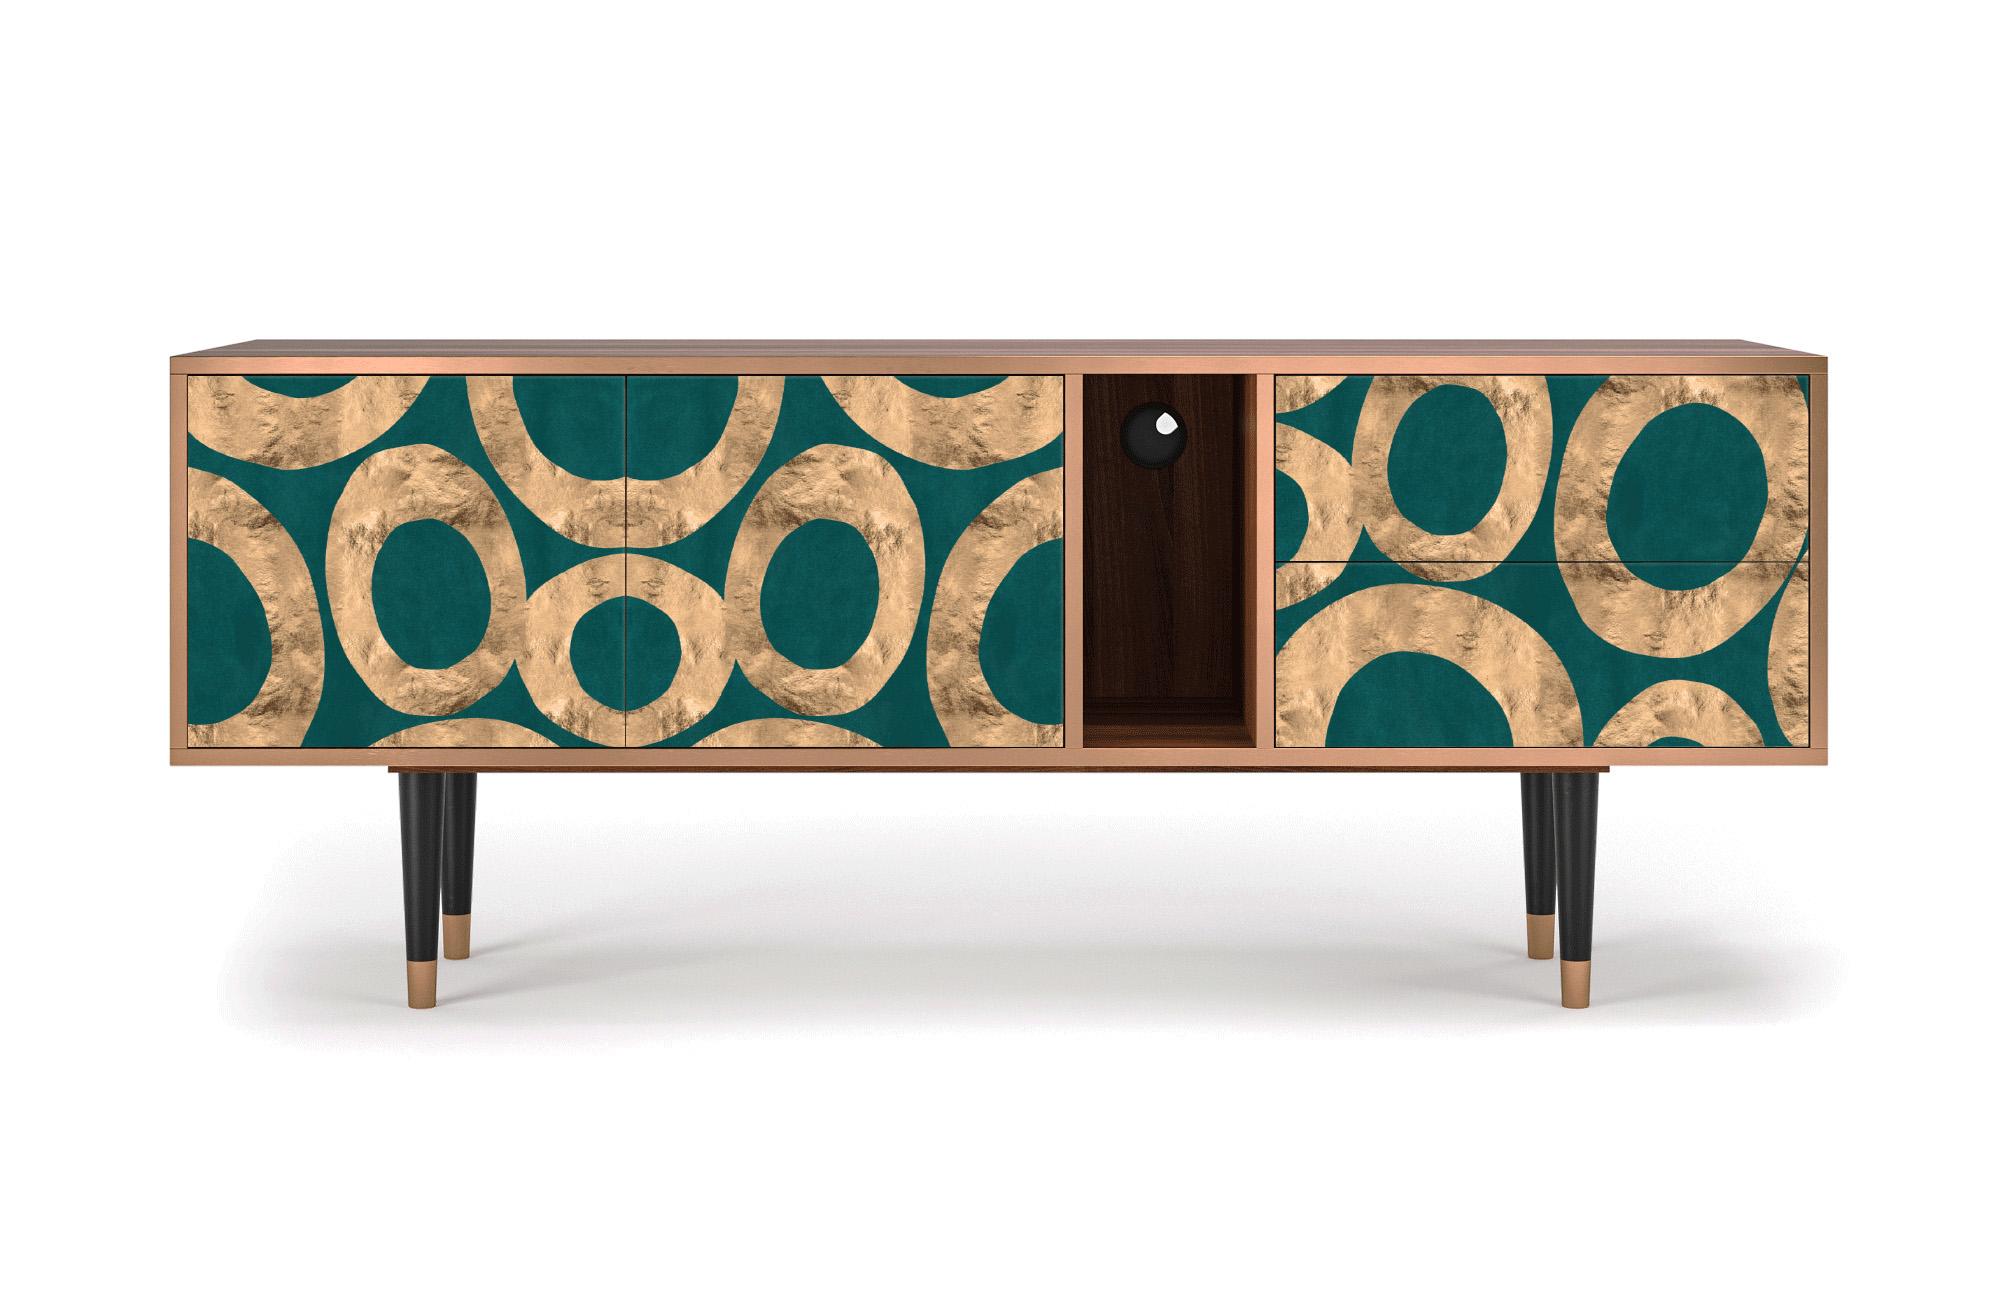 Meuble TV bleu-vert 170cm 2 tiroirs et 2 portes